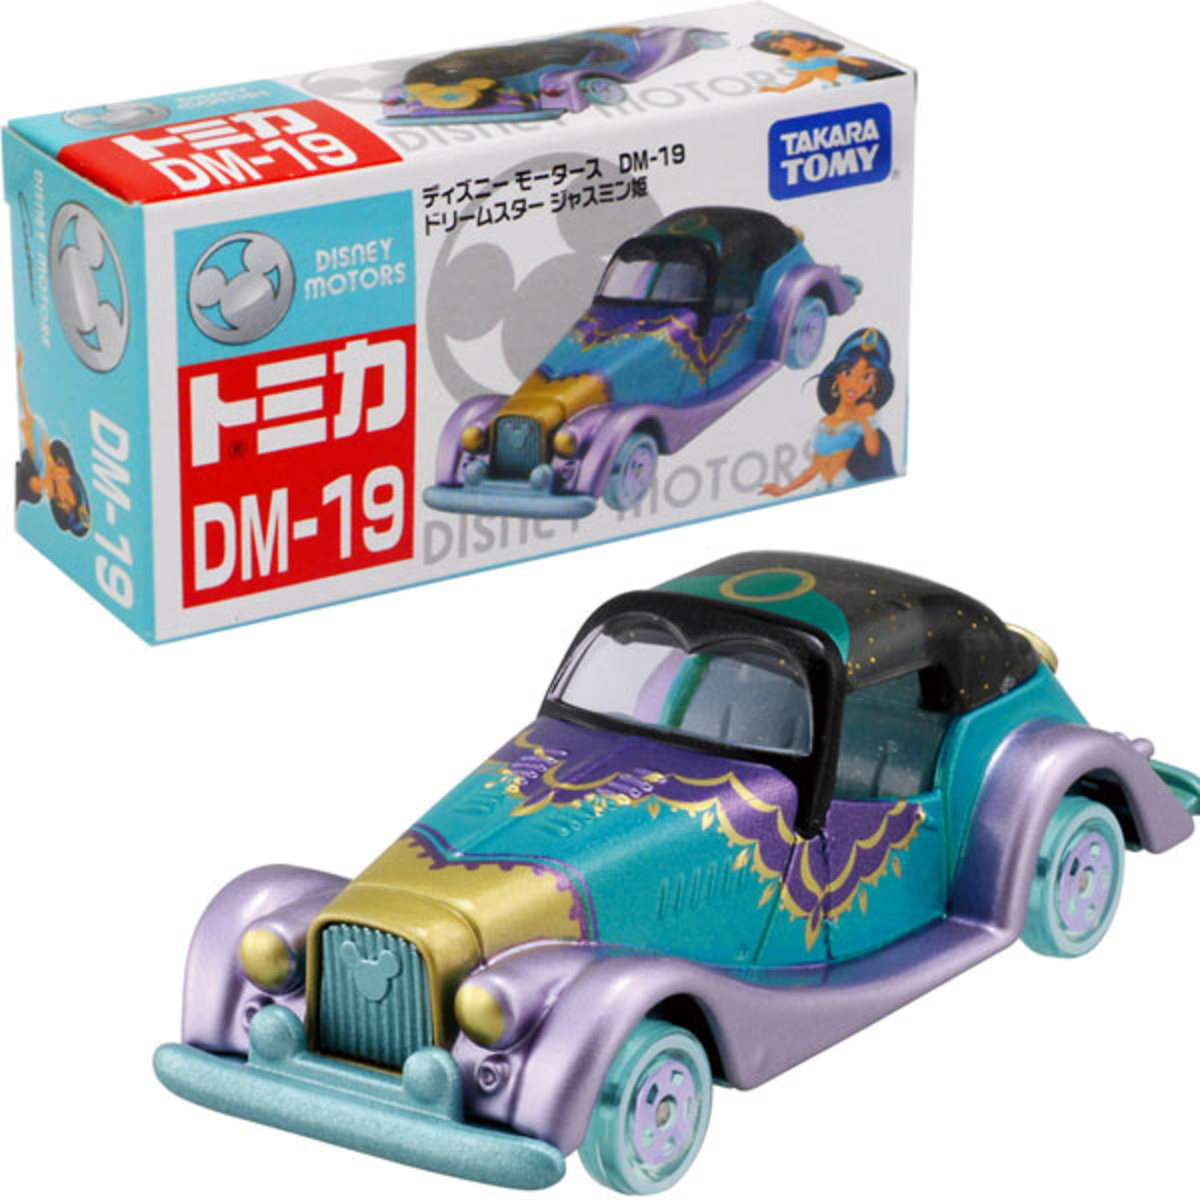 Japanese Version Disney Motors DM-19 Aladdin Jasmine Princess(115663)